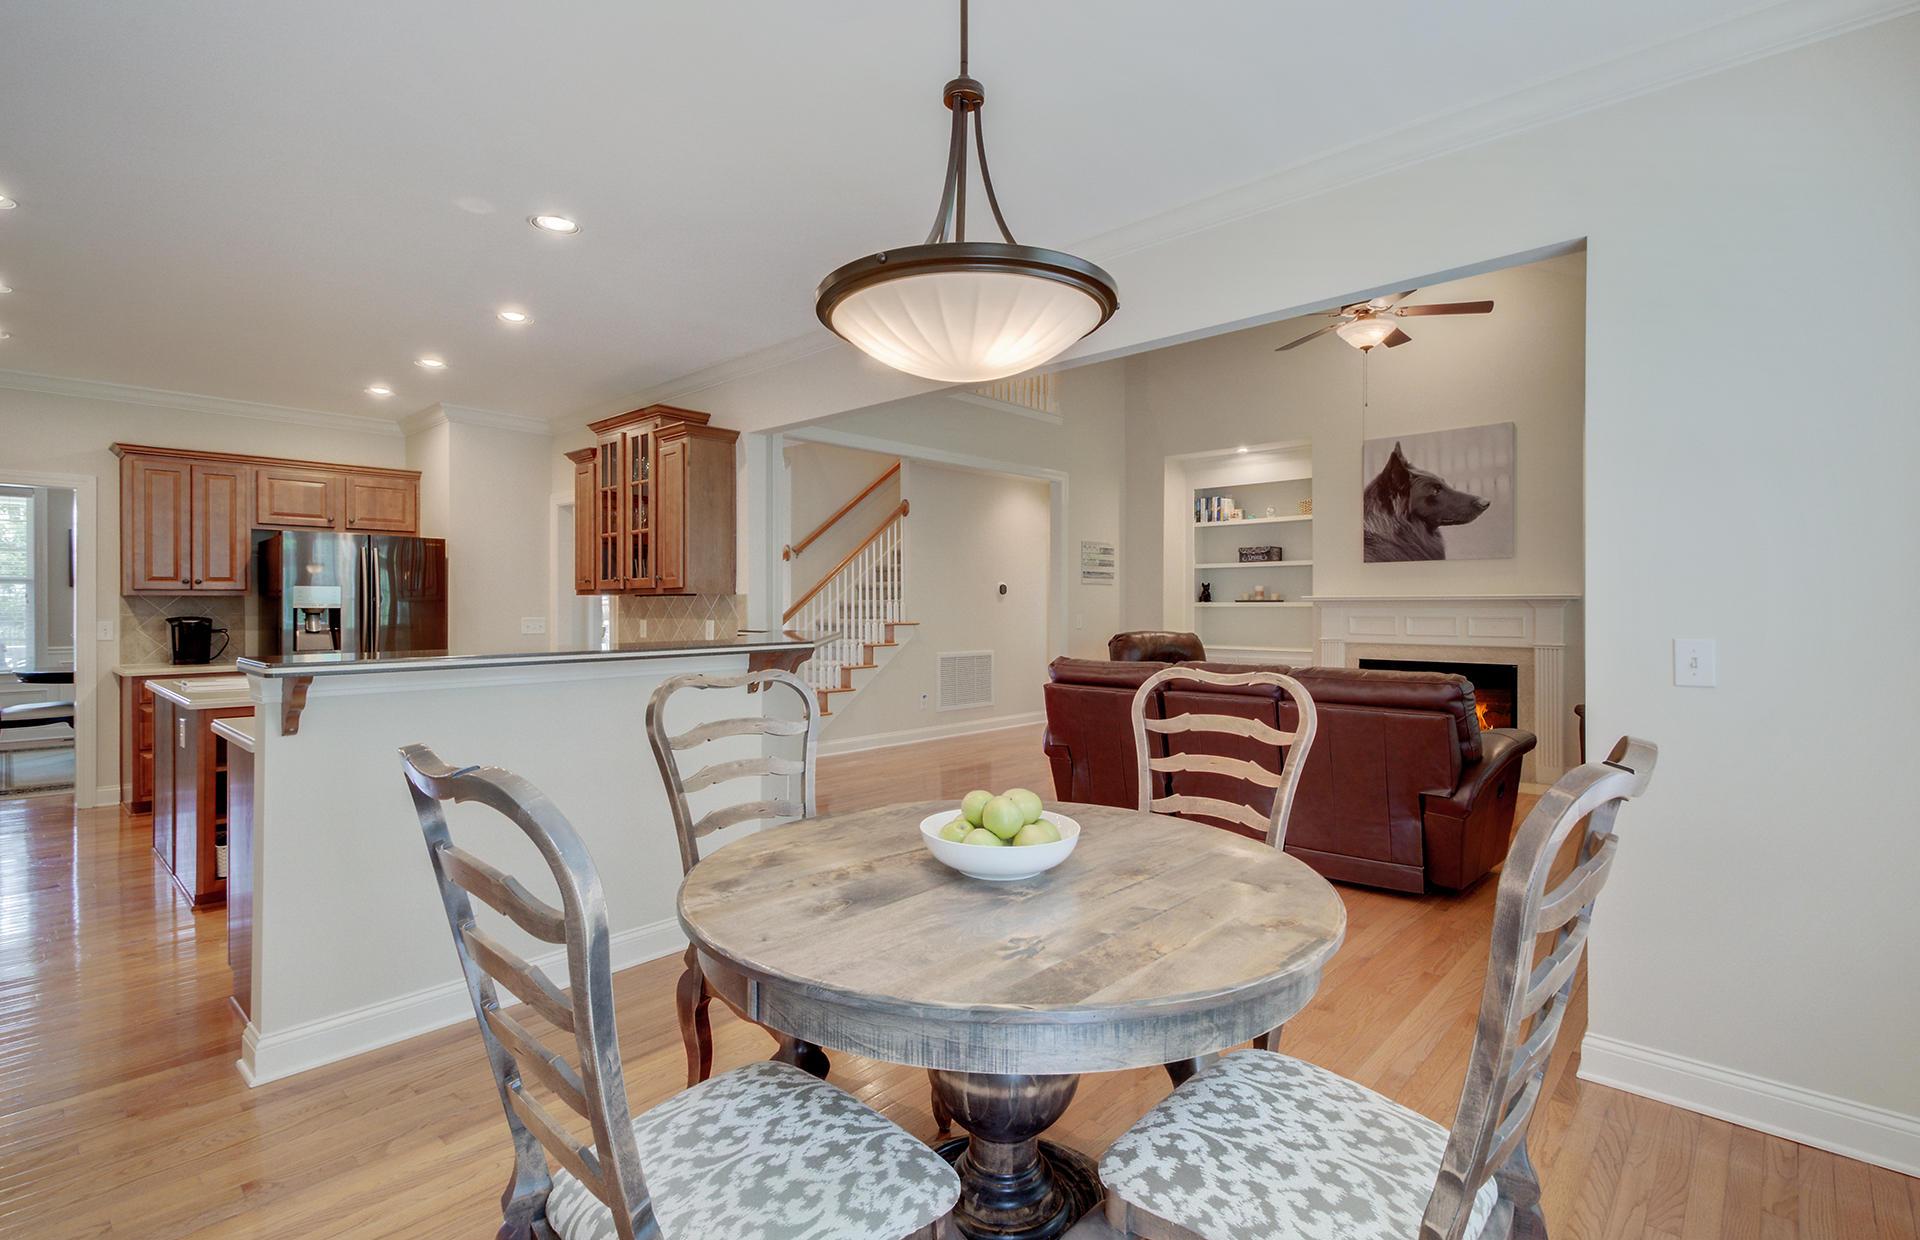 Dunes West Homes For Sale - 2453 Darts Cove, Mount Pleasant, SC - 38